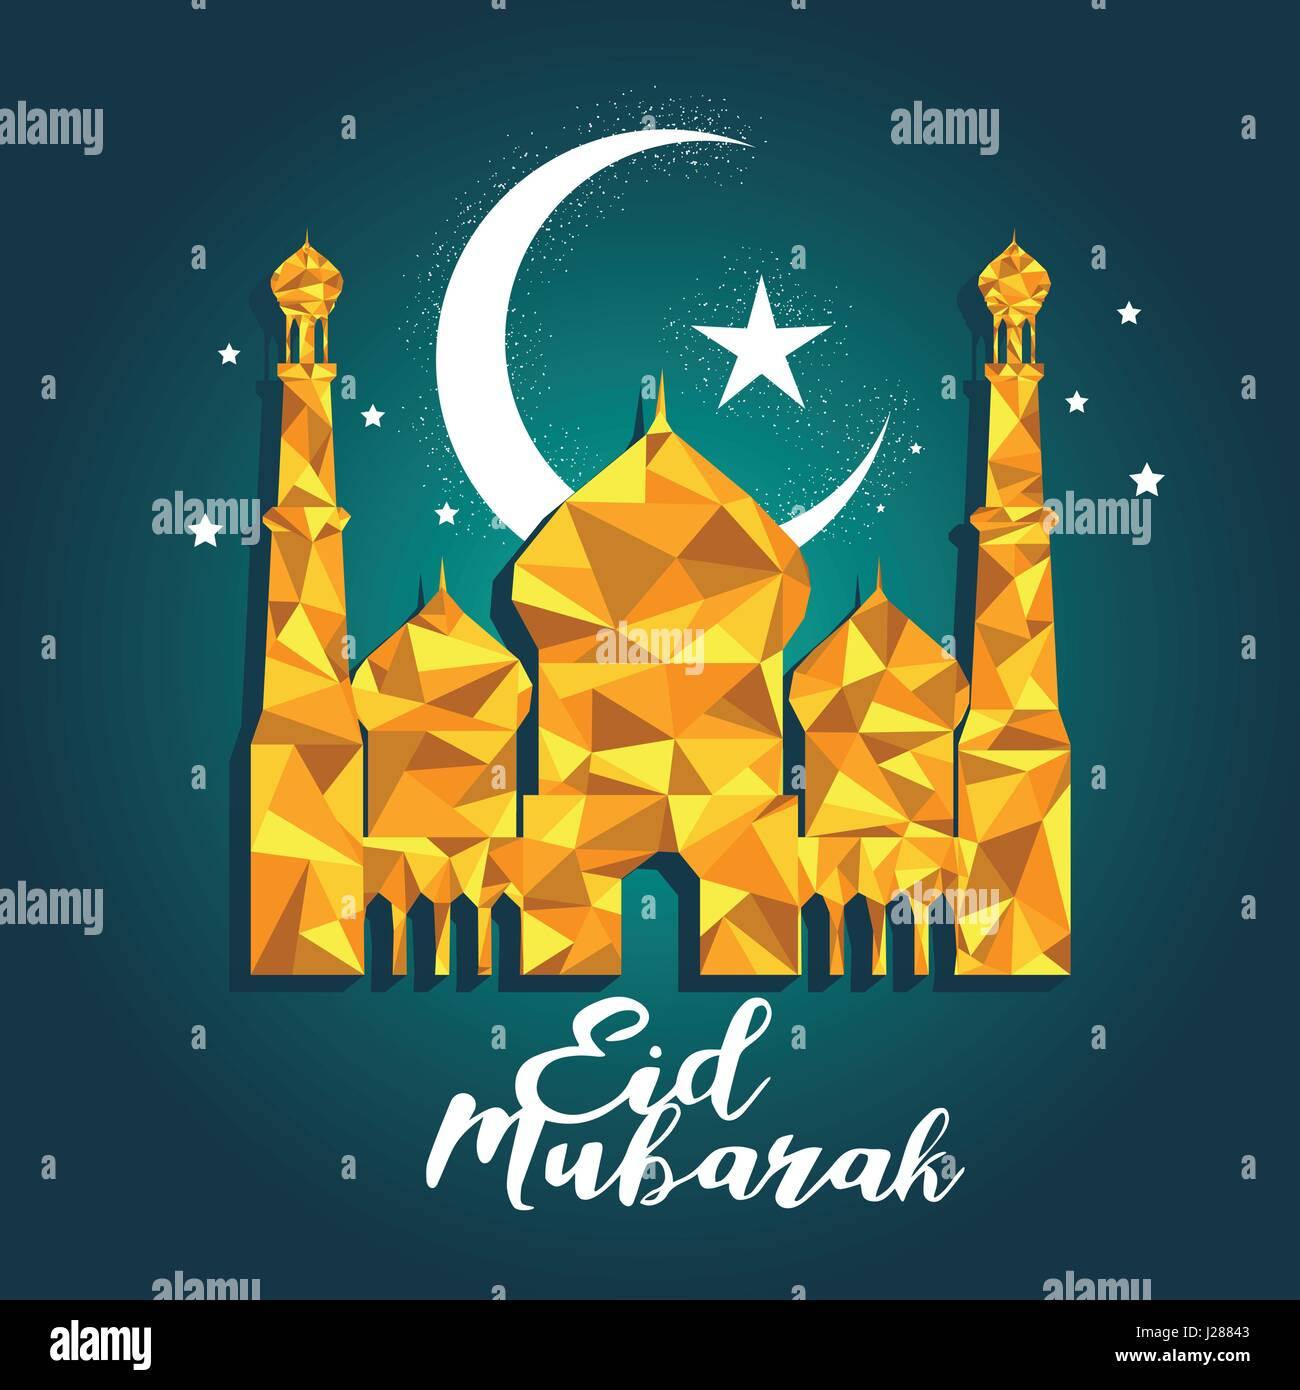 A vector illustration of eid mubarak celebration greeting card stock a vector illustration of eid mubarak celebration greeting card m4hsunfo